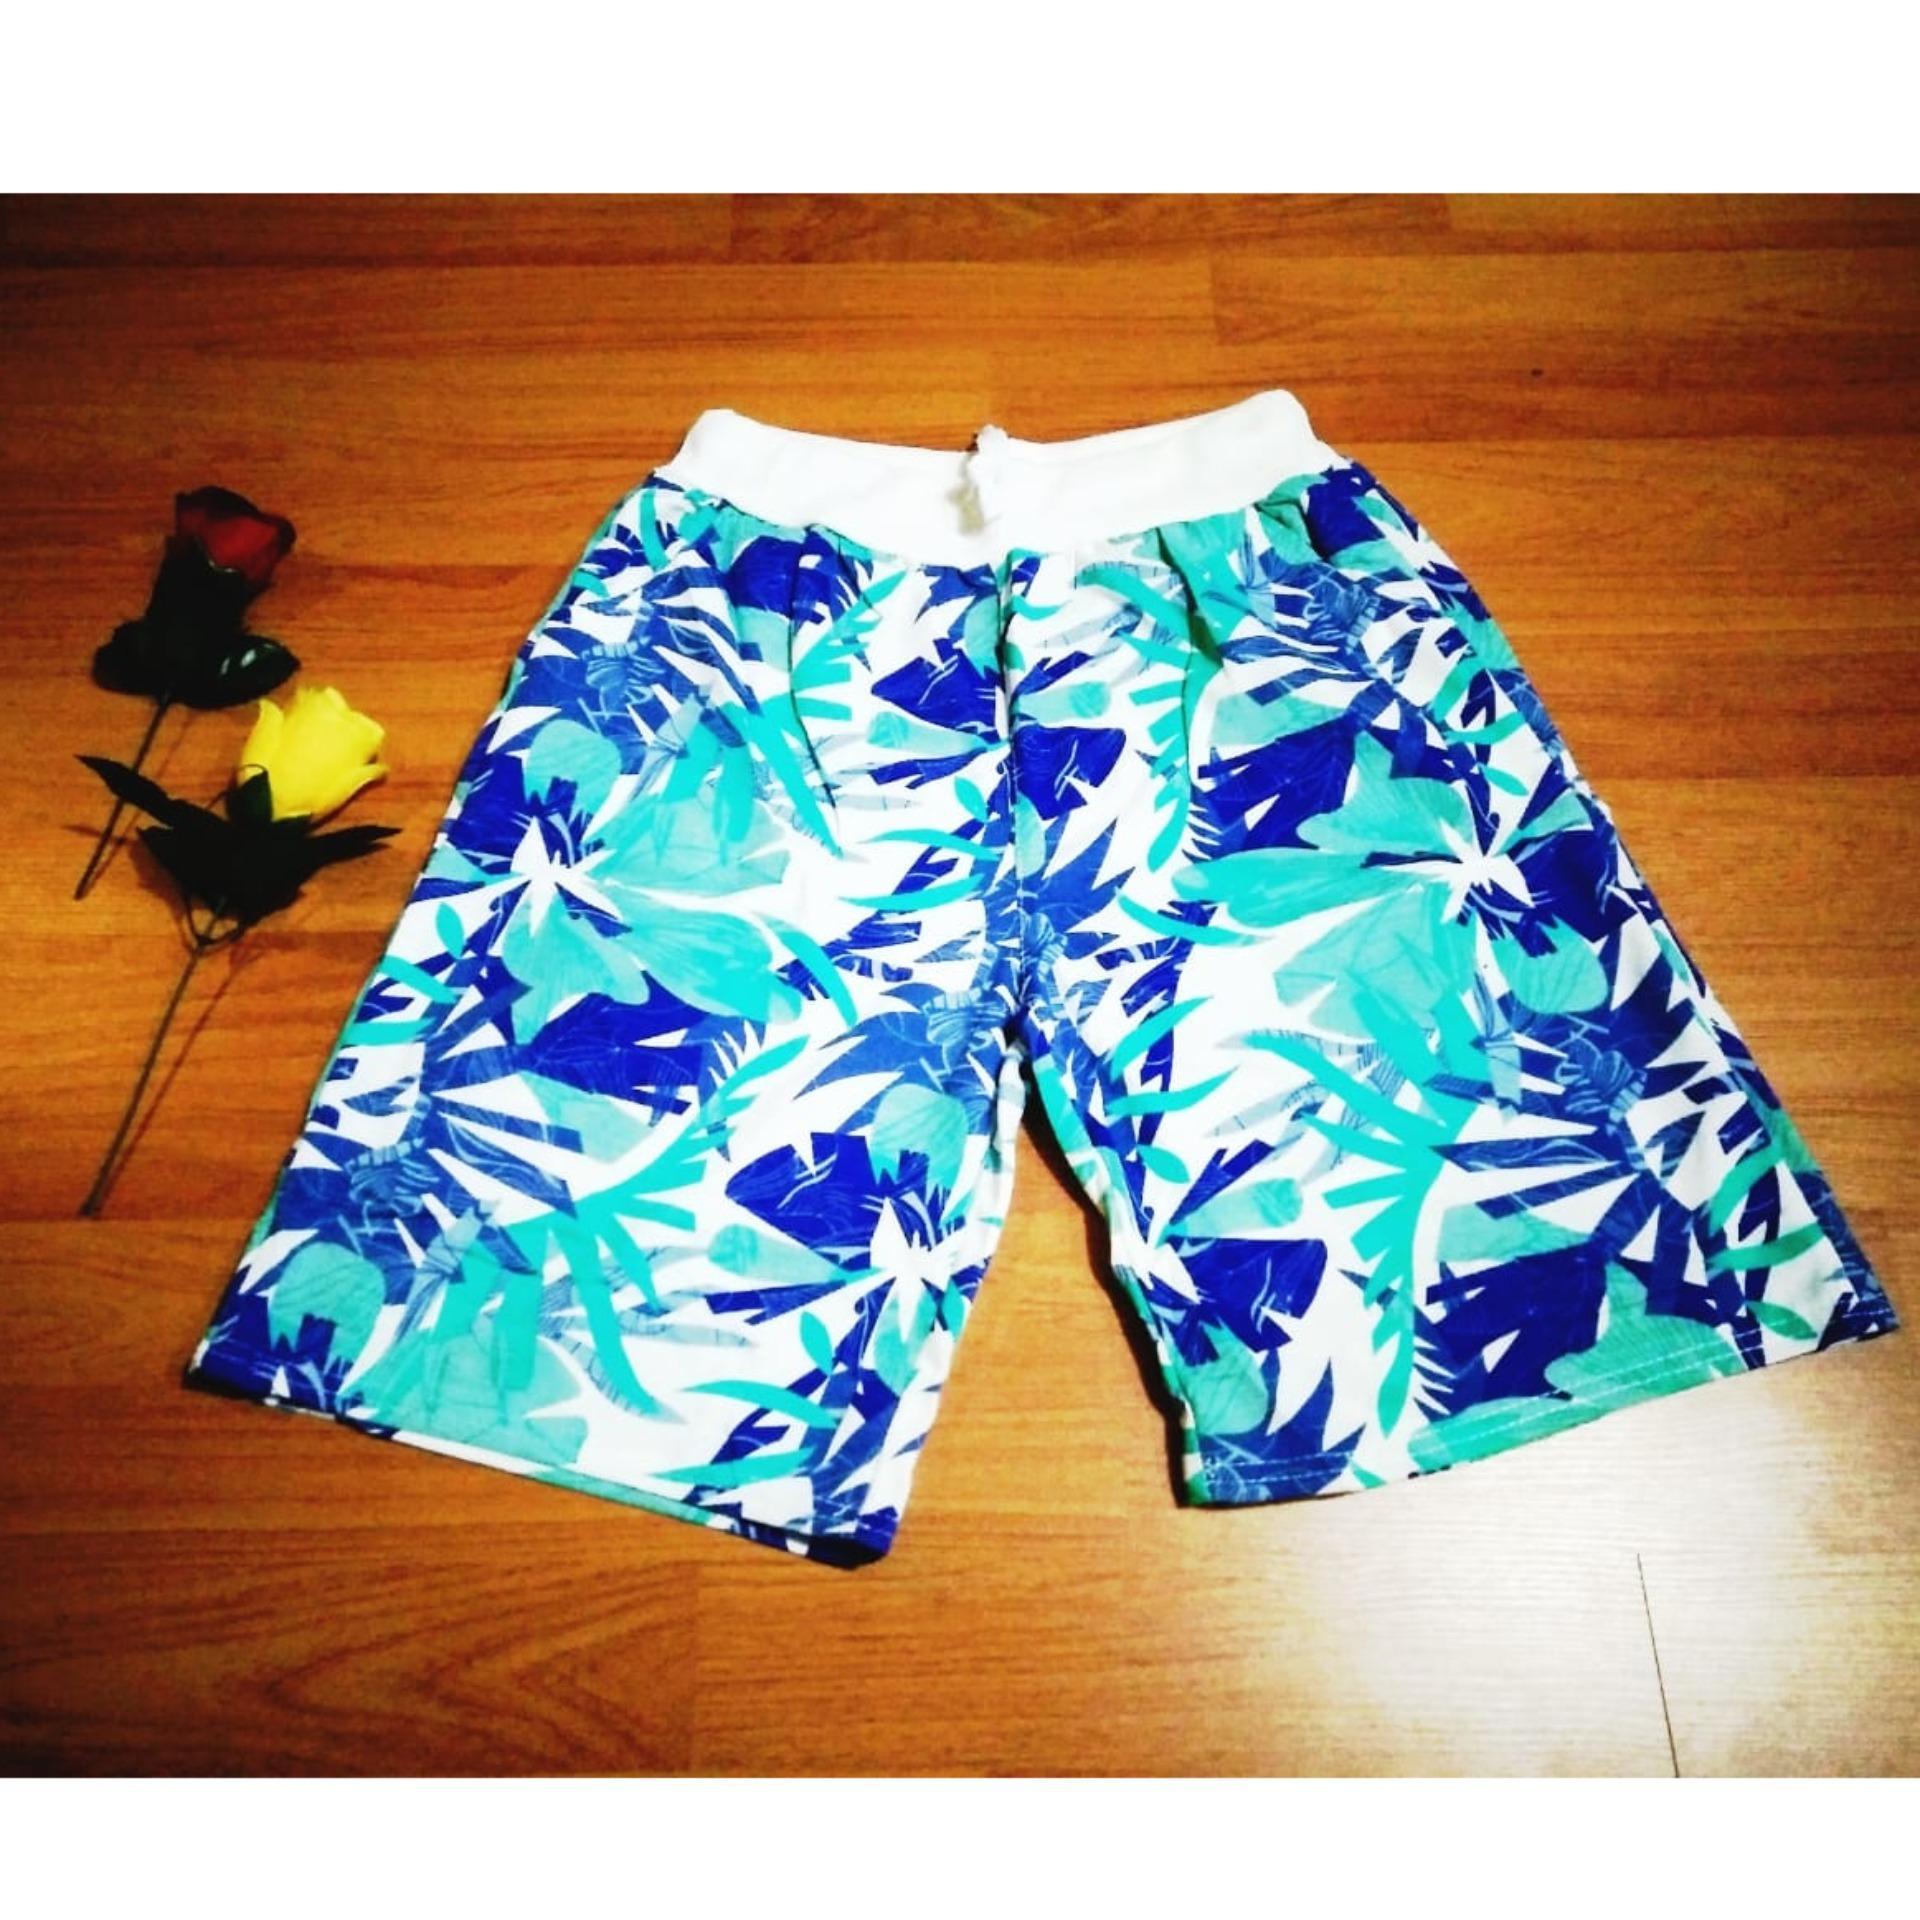 Kelebihan Imported Women Short Pants Baby Terry Celana Pendek Santai Vm Pria Hitam Rgs Store Import Pantai Distro